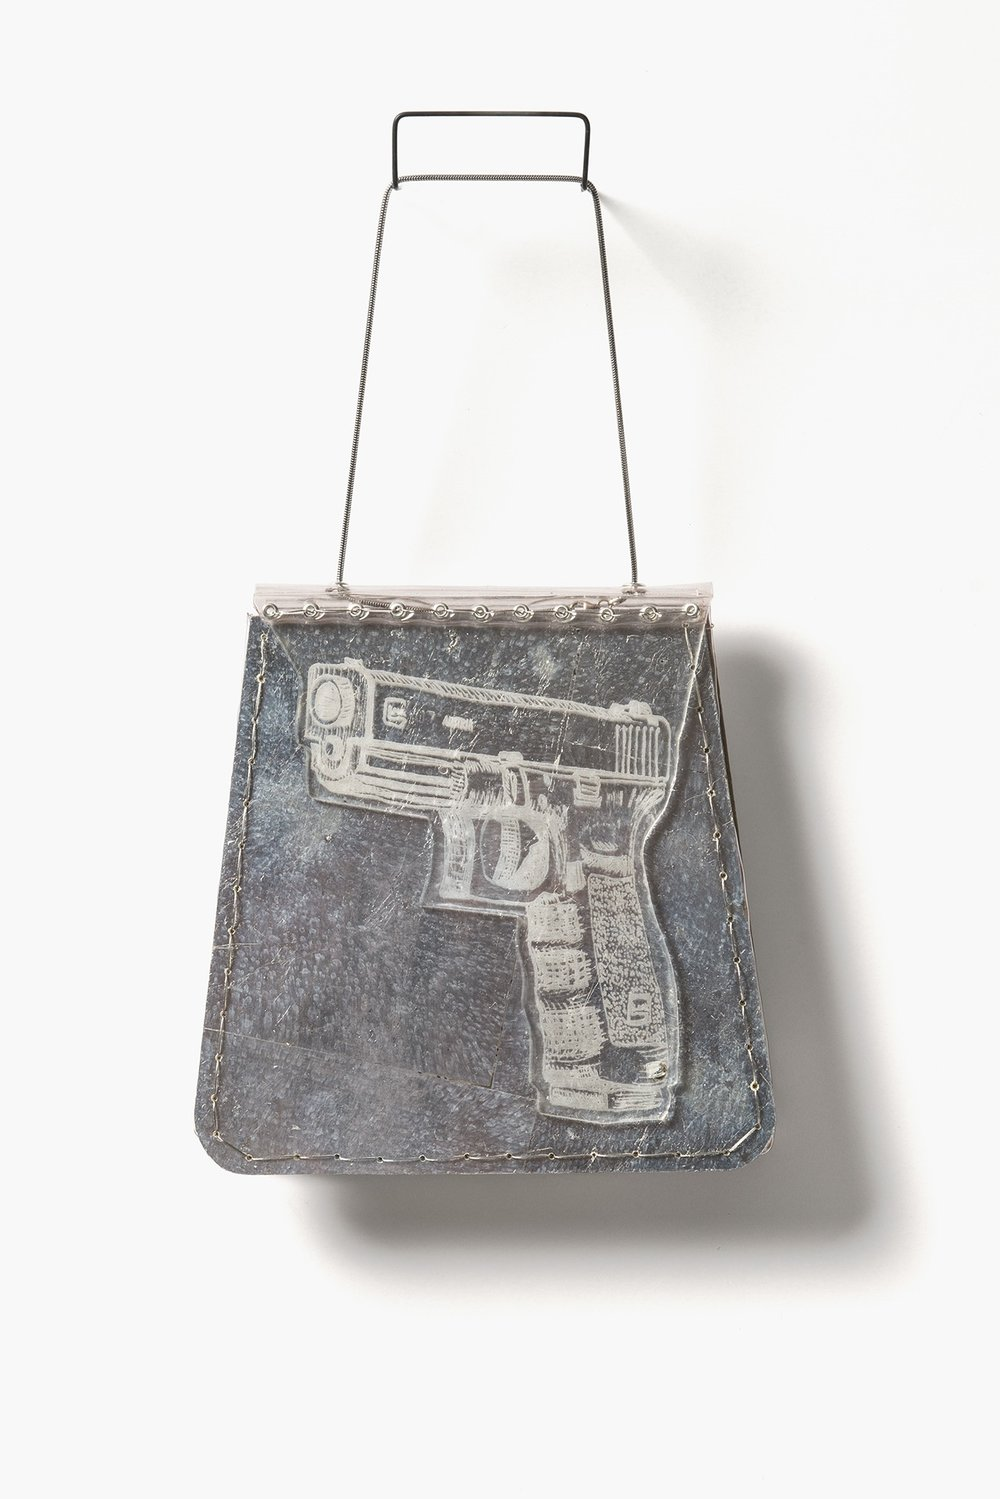 Silver Glock, ValerieMann_03-16-18_06.jpg